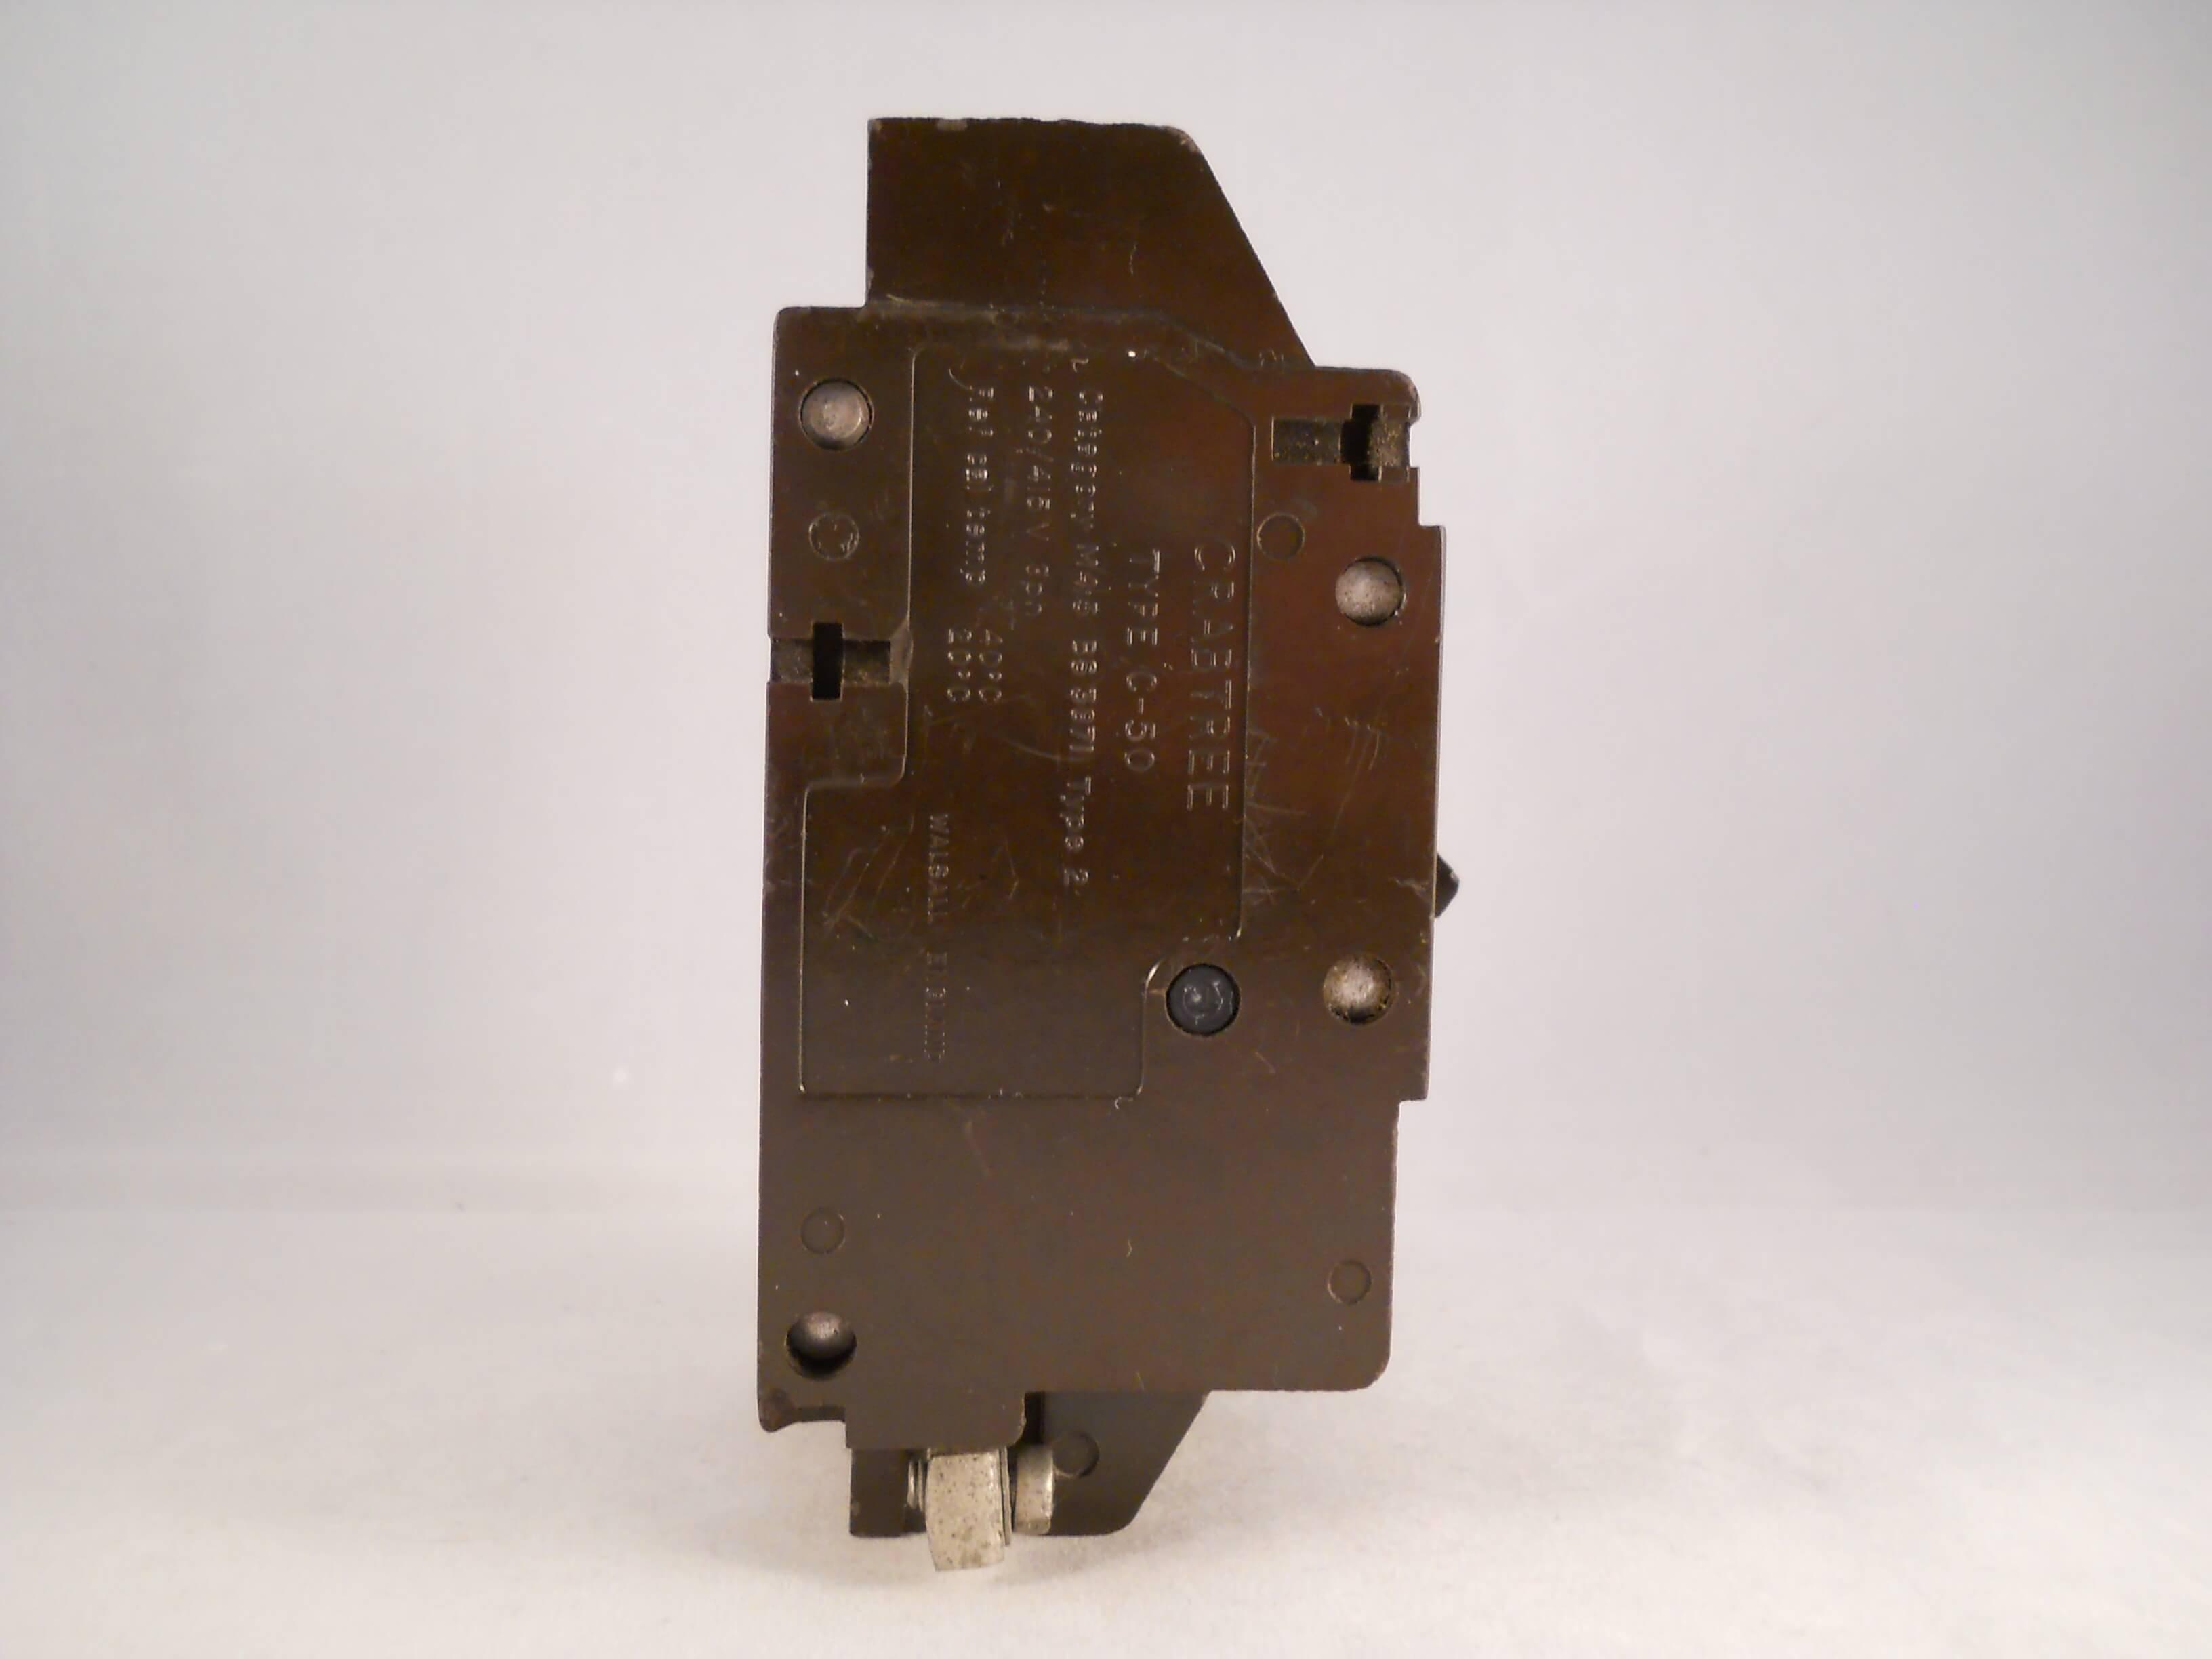 Crabtree C50 Mcb 60 Amp Type C 60a Triple Pole 3 Phase